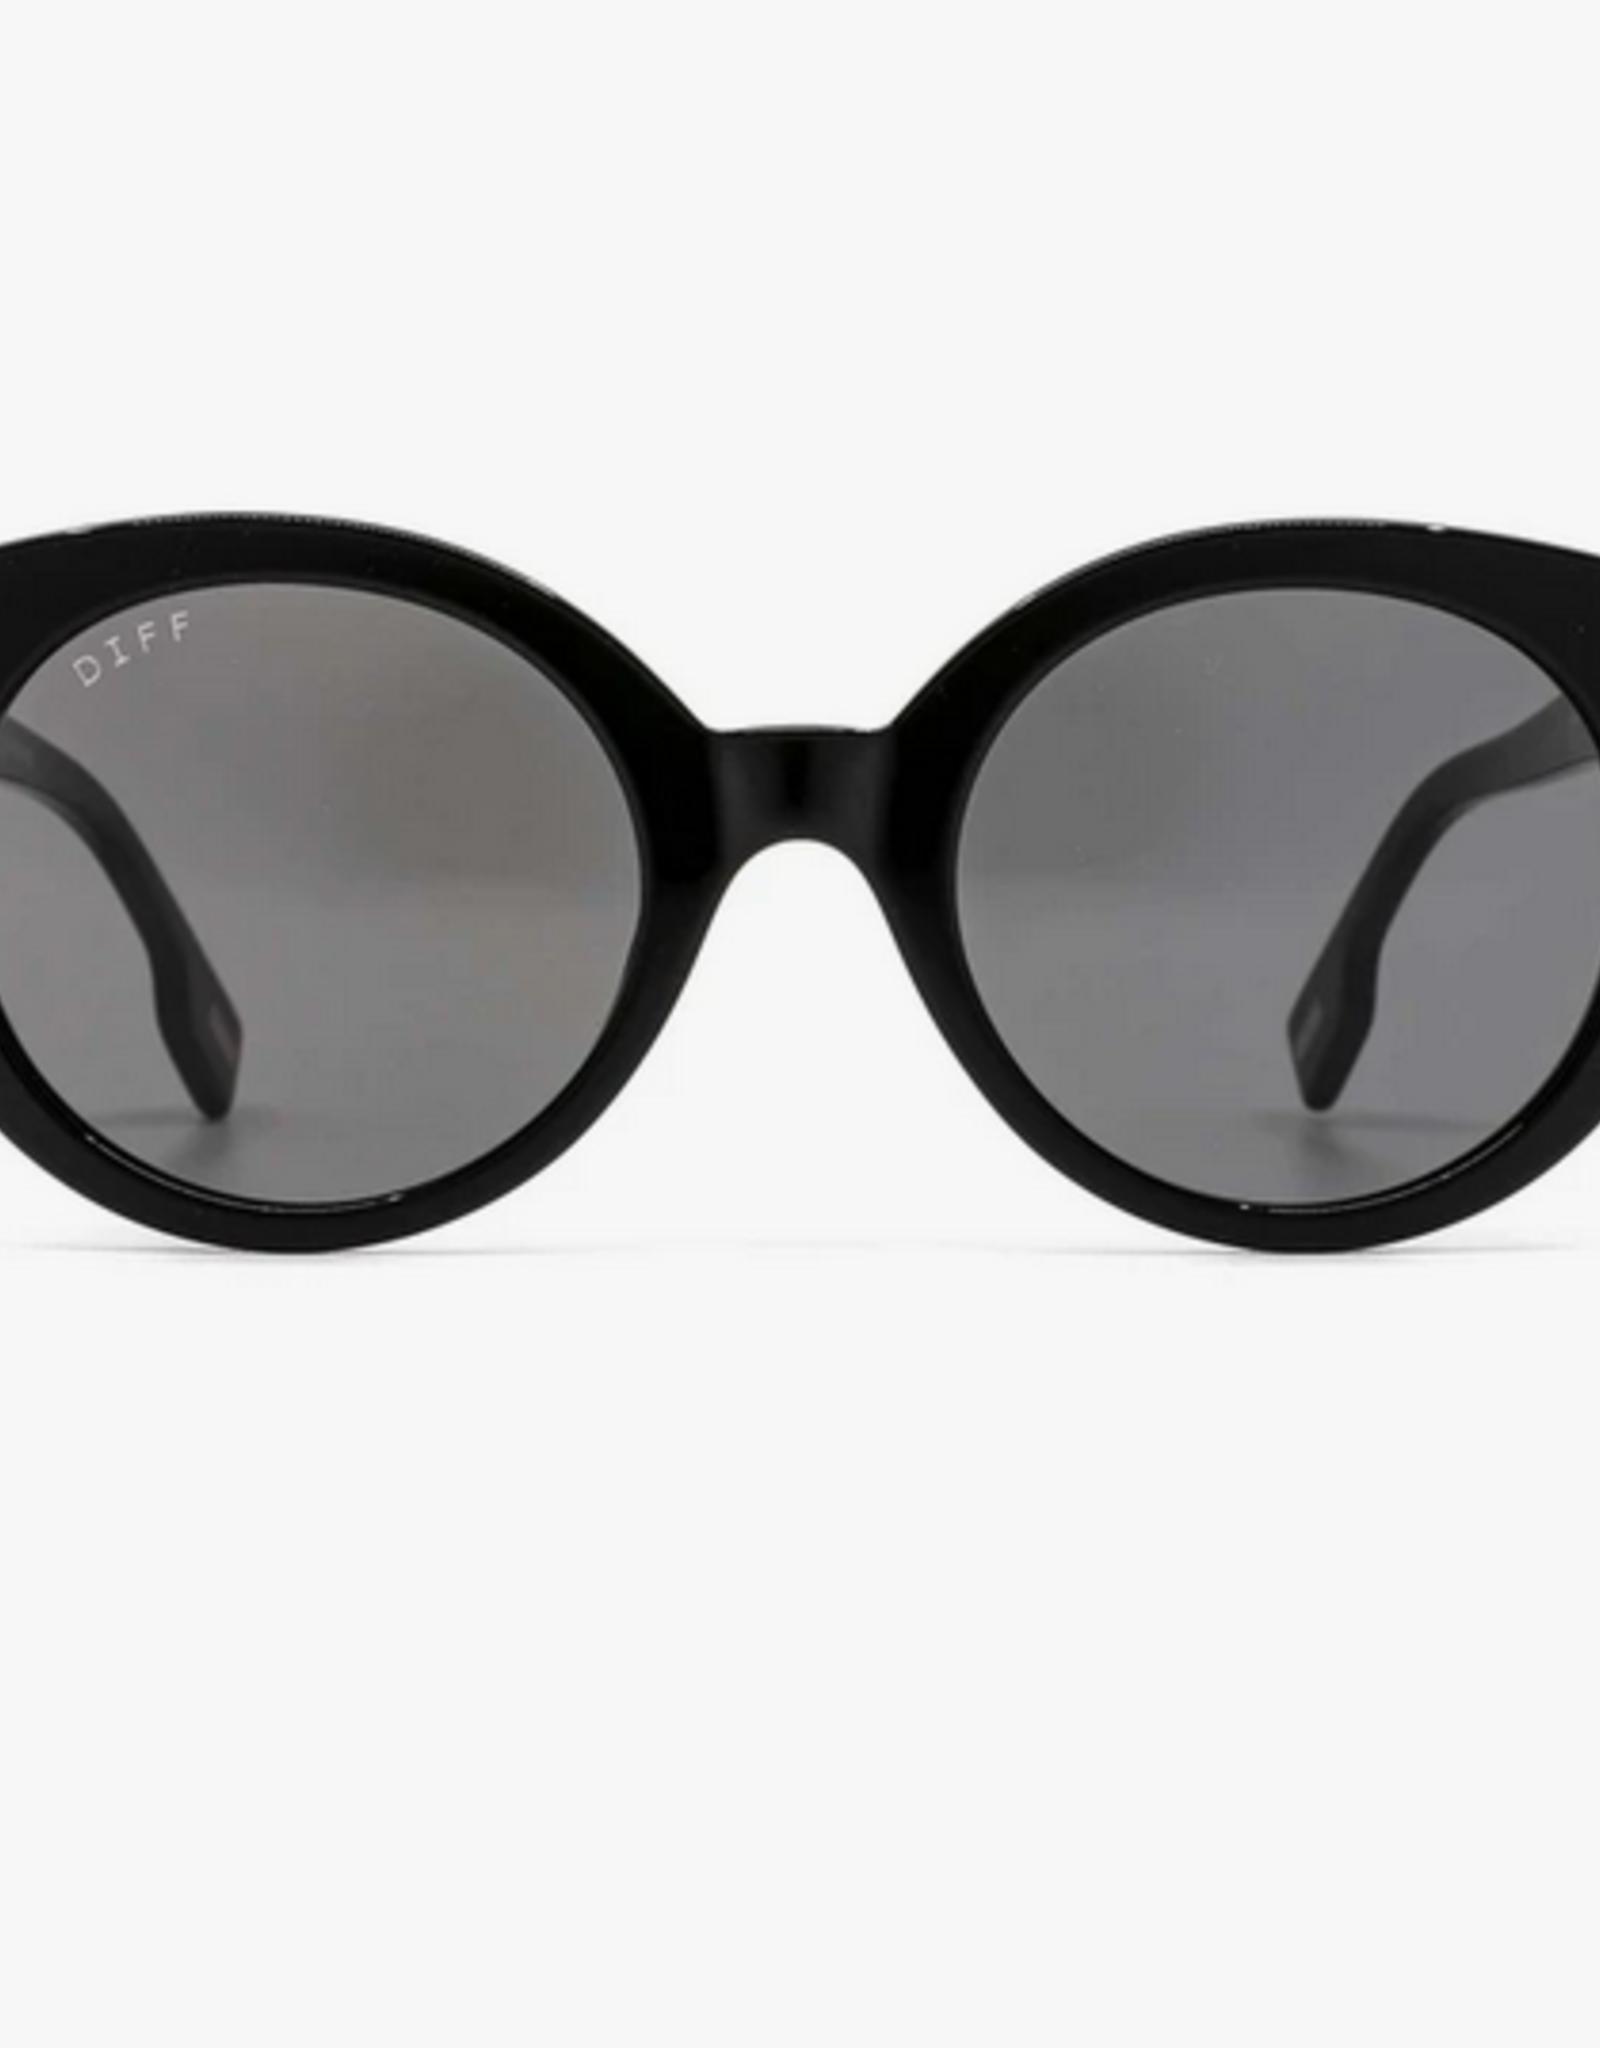 DIFF EMMY - Sunglasses